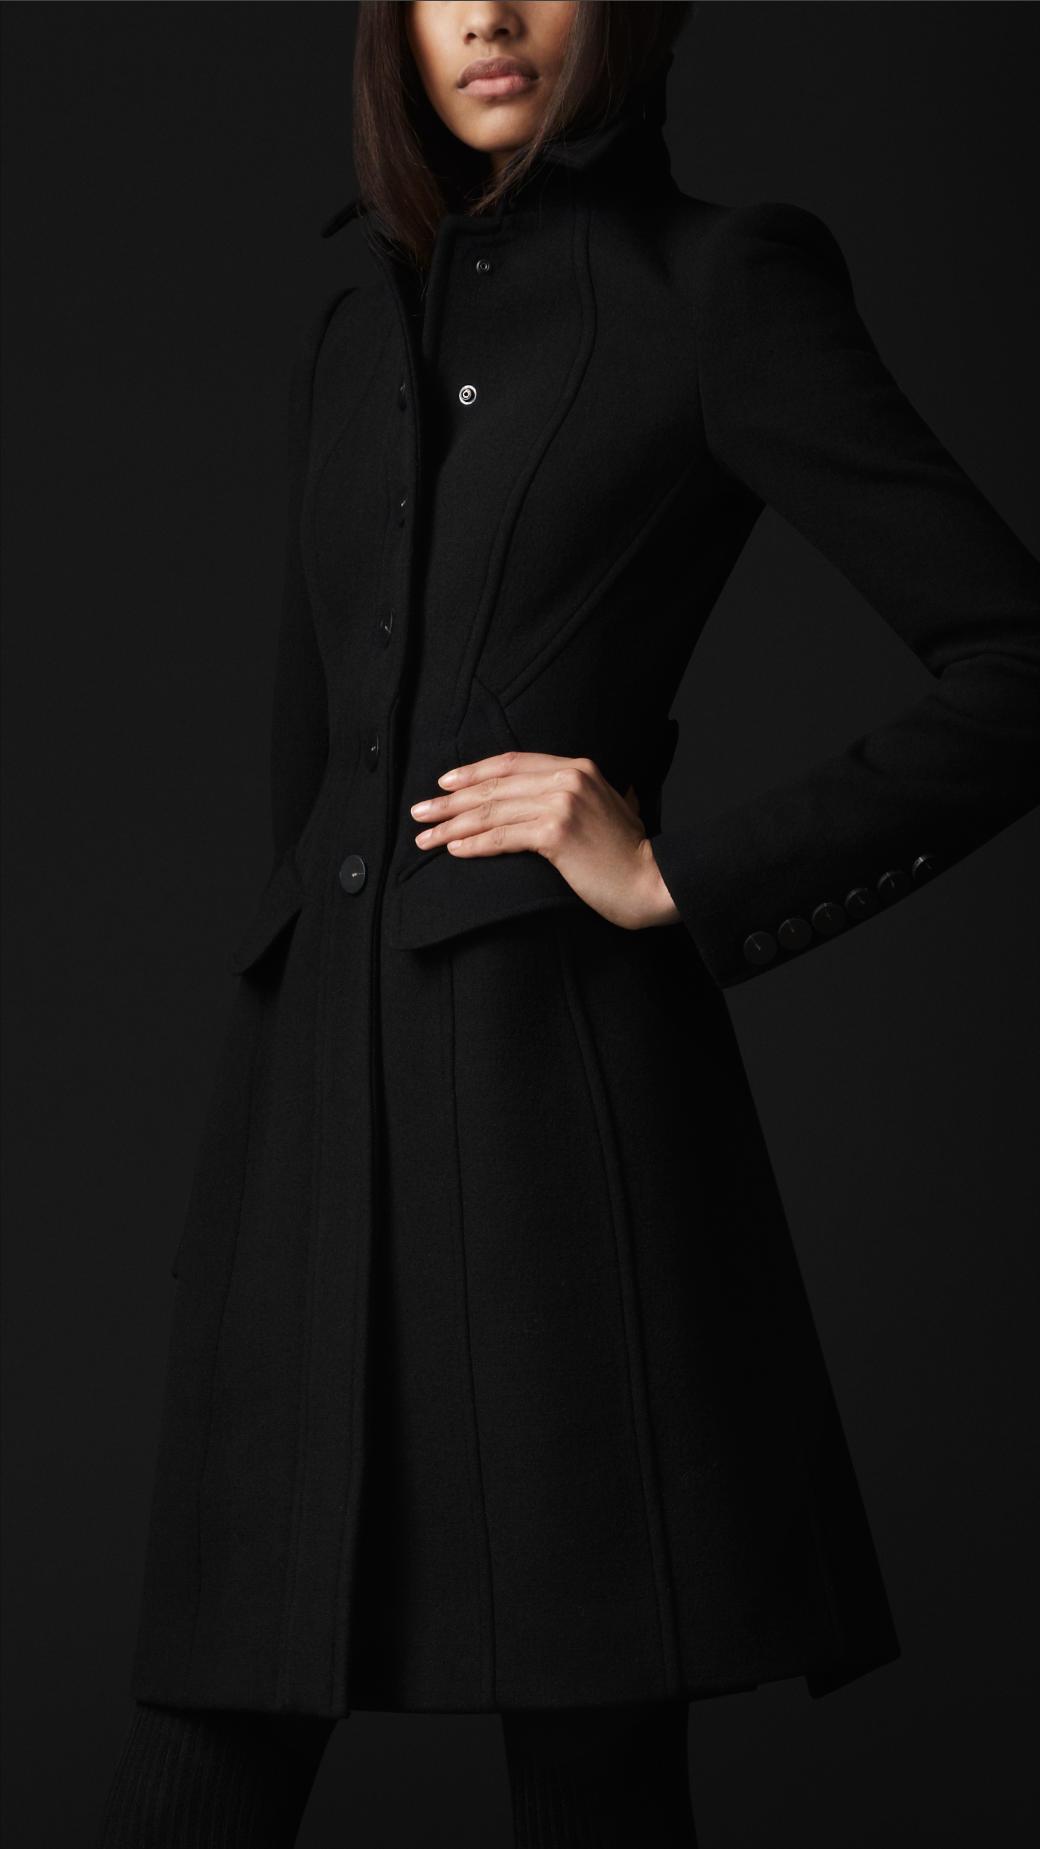 Burberry Prorsum Cr 234 Pe Wool Tailored Coat In Black Lyst